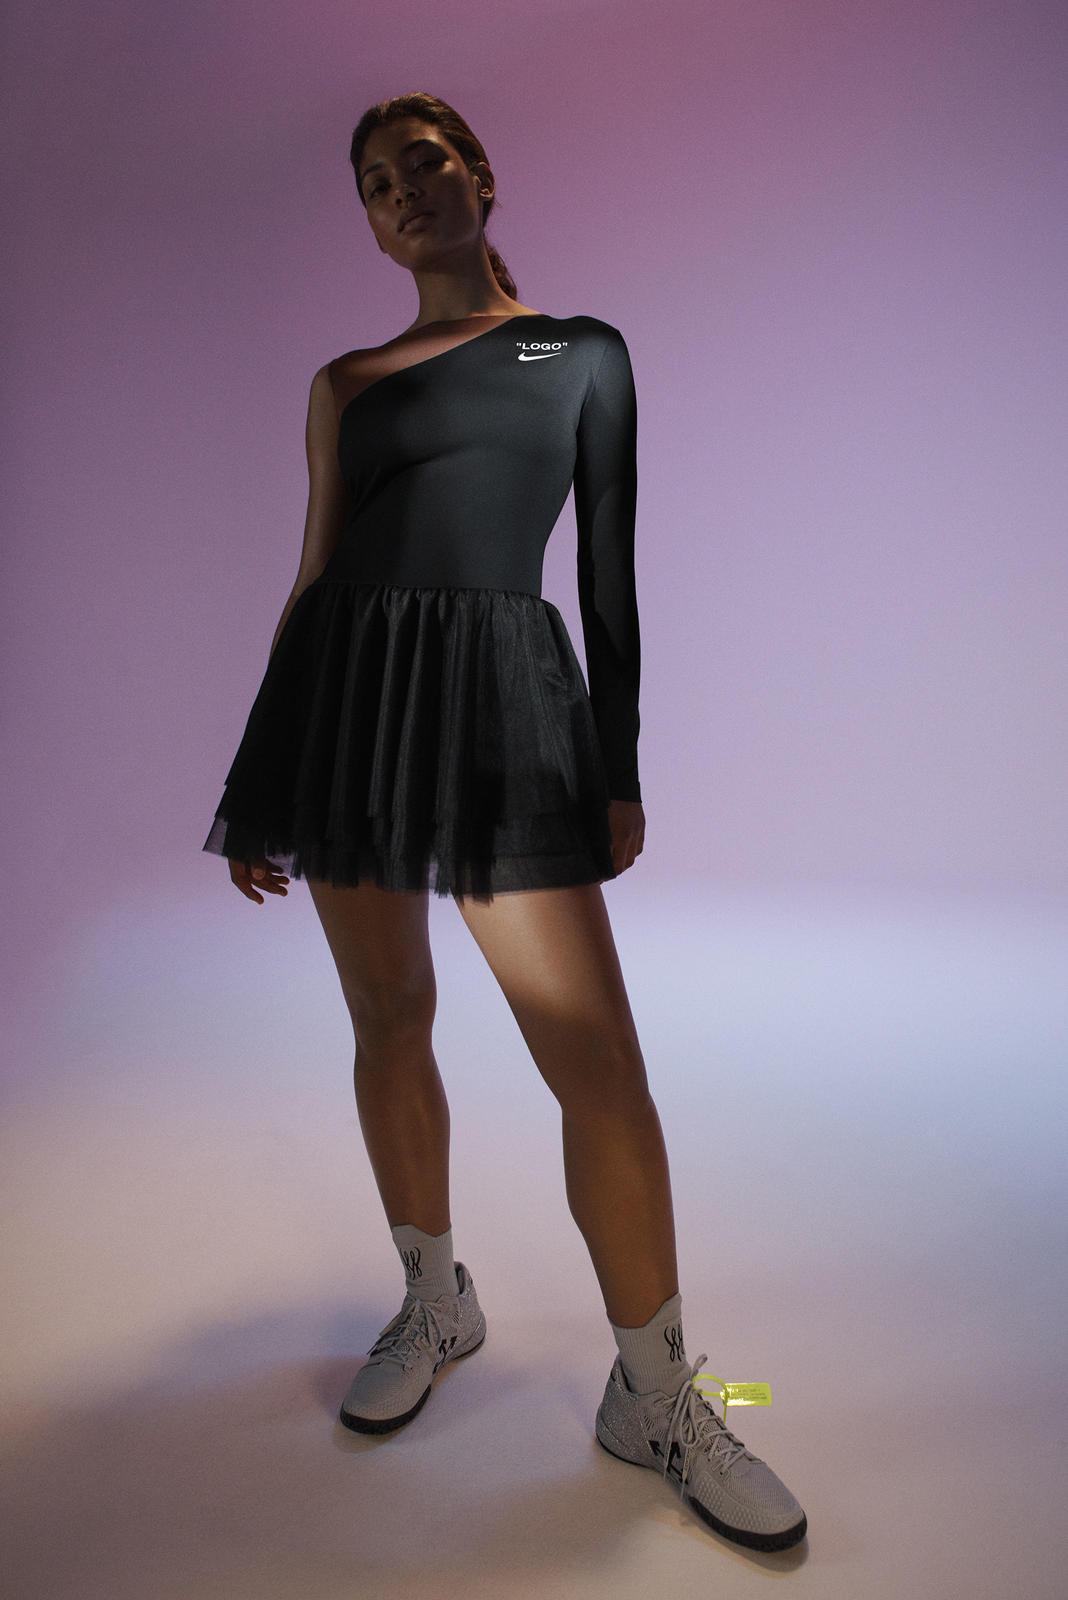 Nike-x-Virgil-Abloh-for-Serena